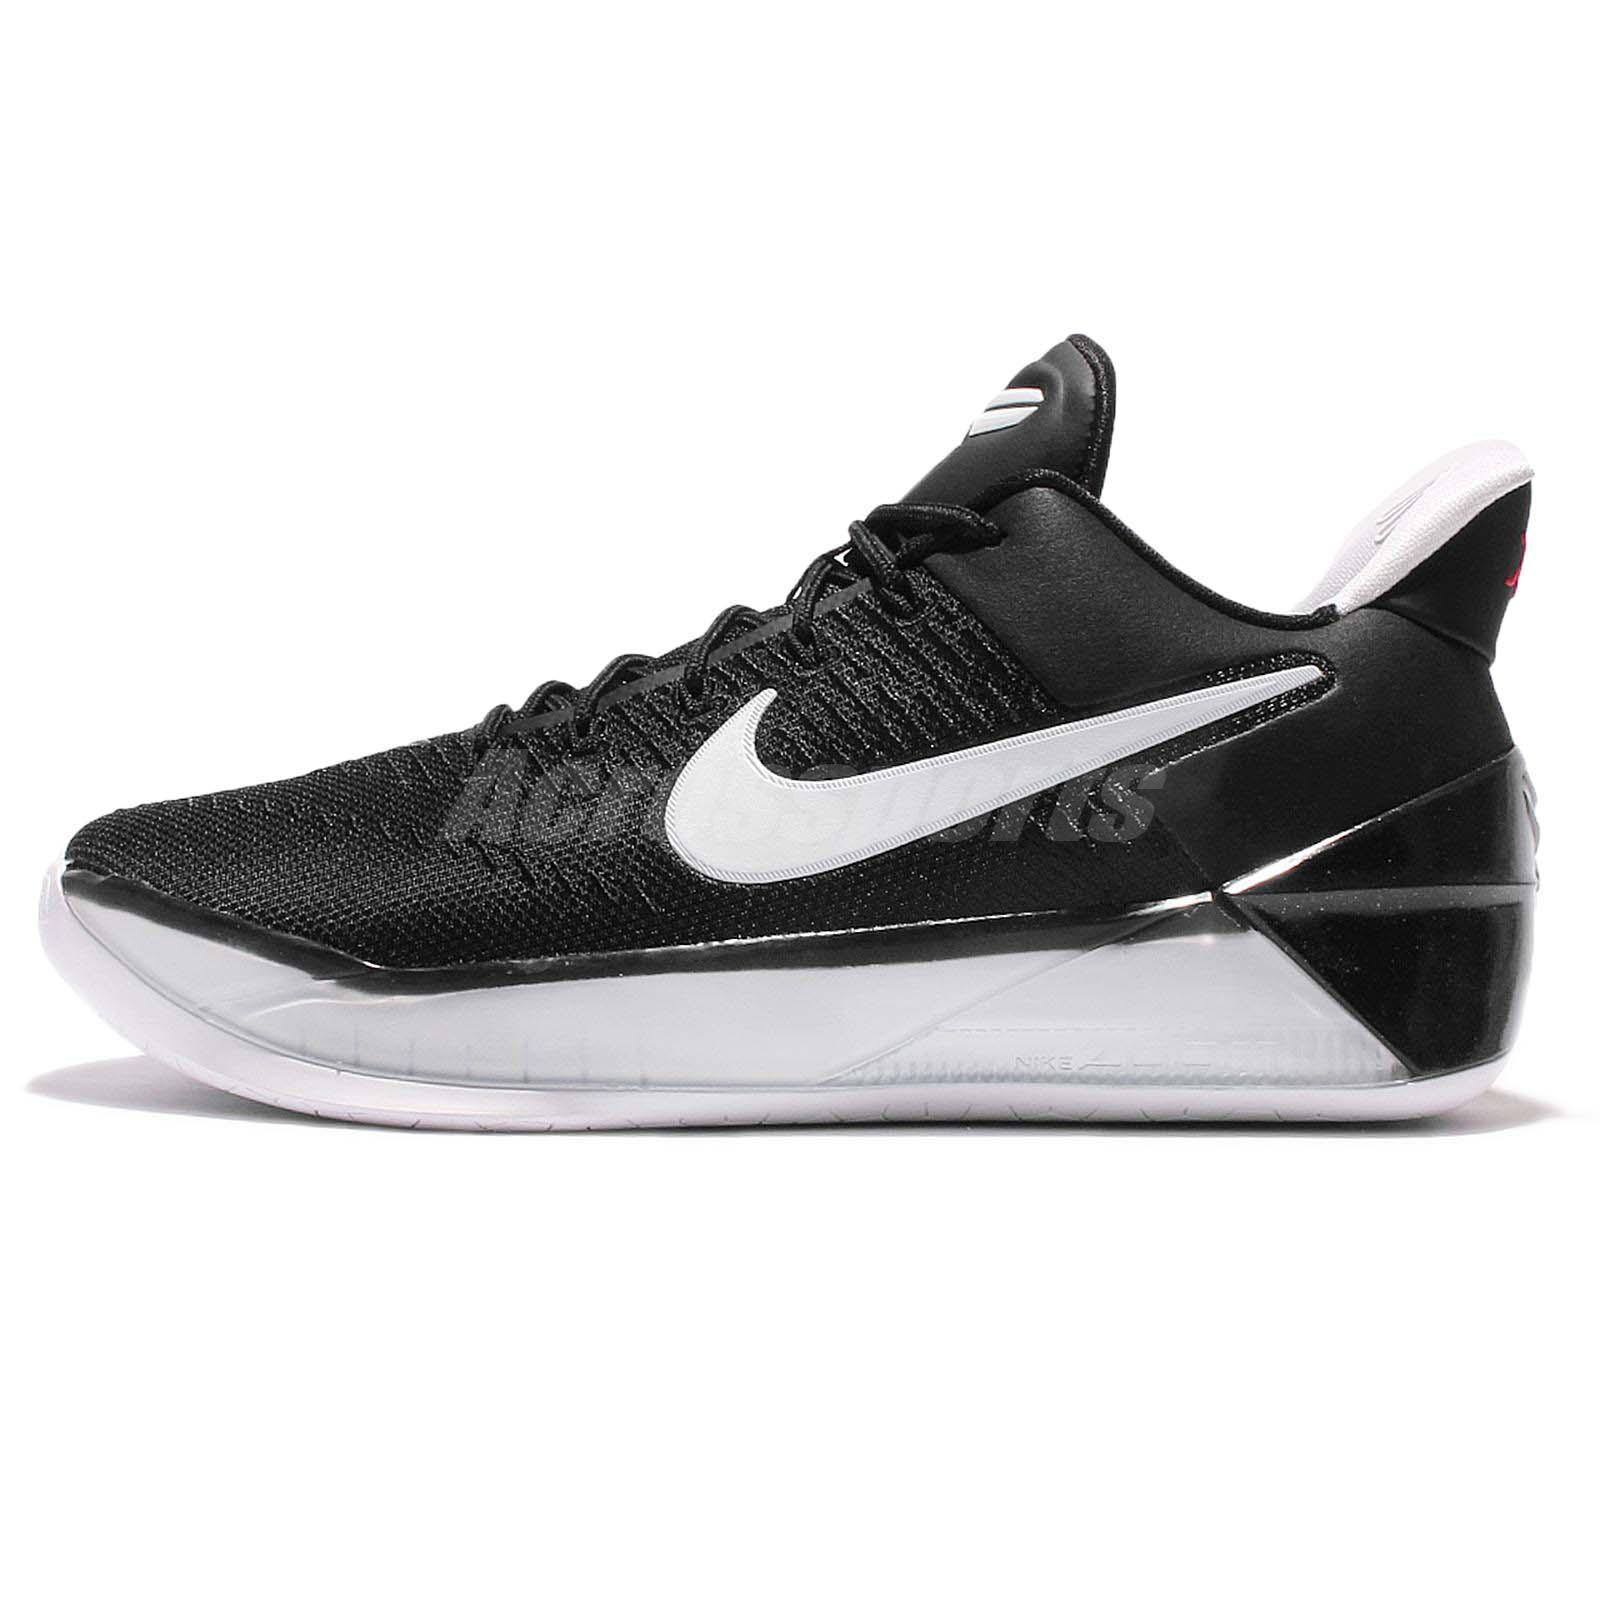 Nike Kobe A.D. GS AD Bryant Black White Kid Basketball Shoes 869987-001